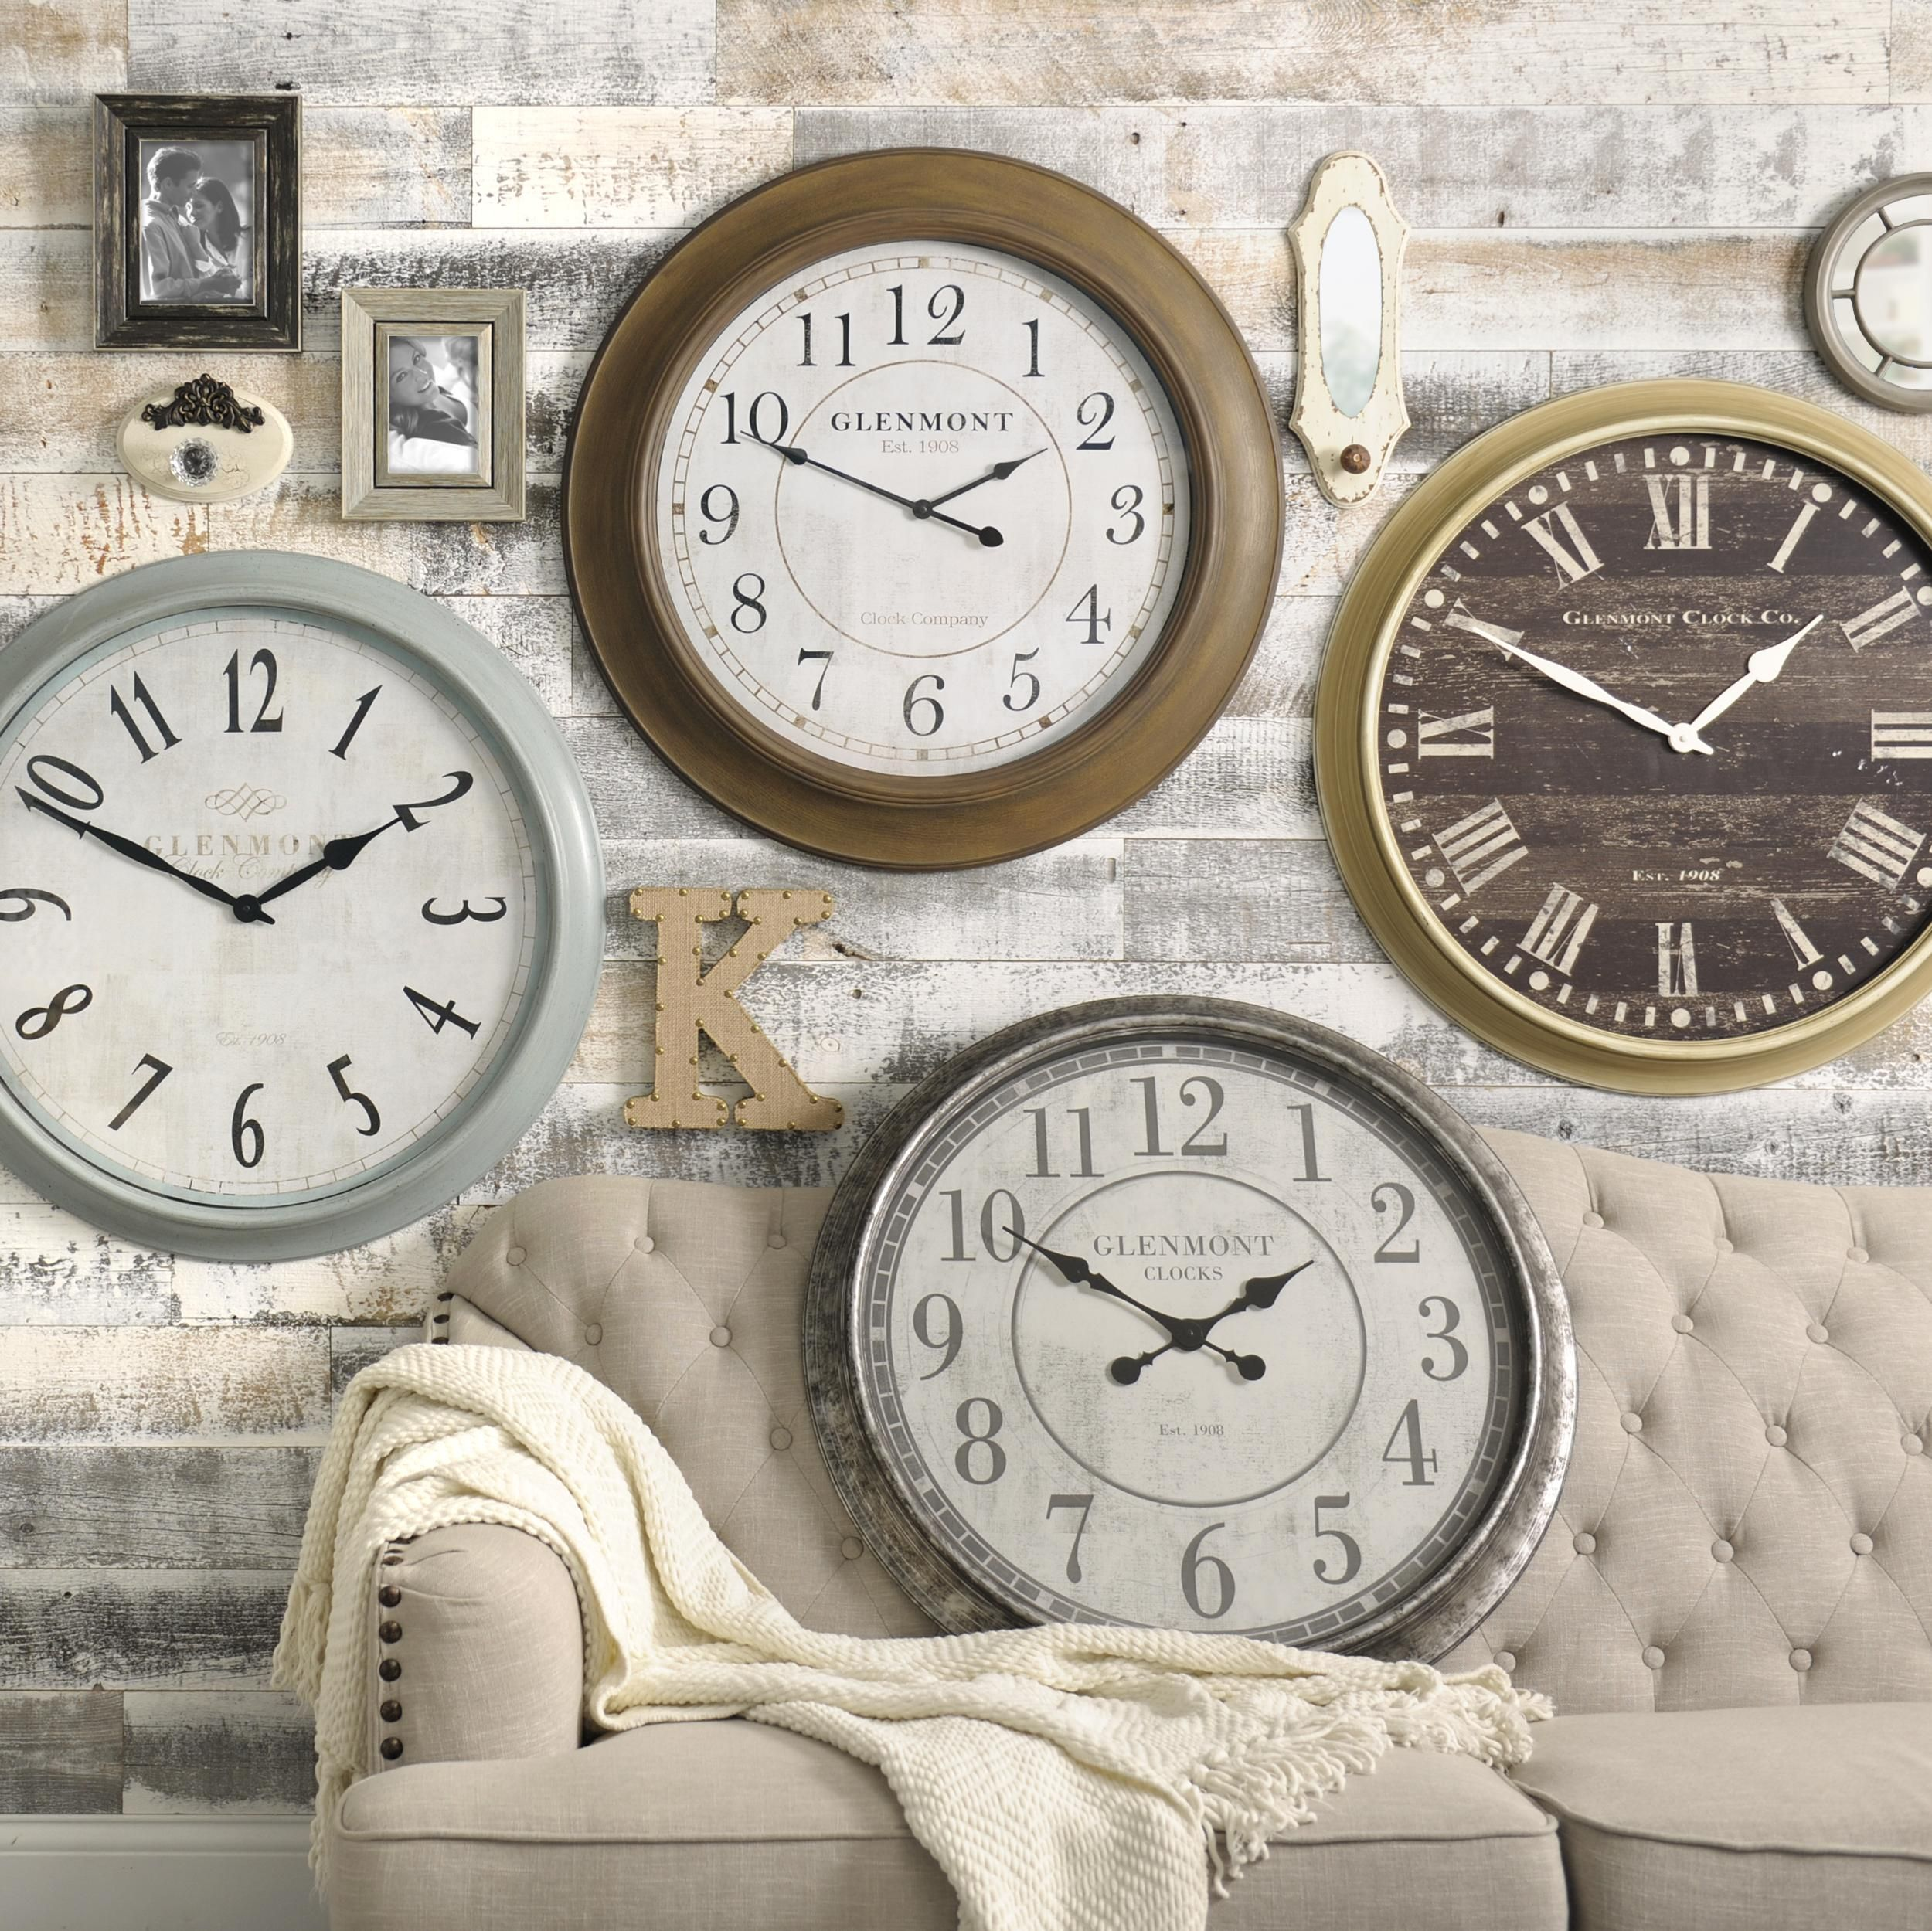 Horloge De Bureau Originale save on 30 inch wall clocks! now through june 7, wall clocks